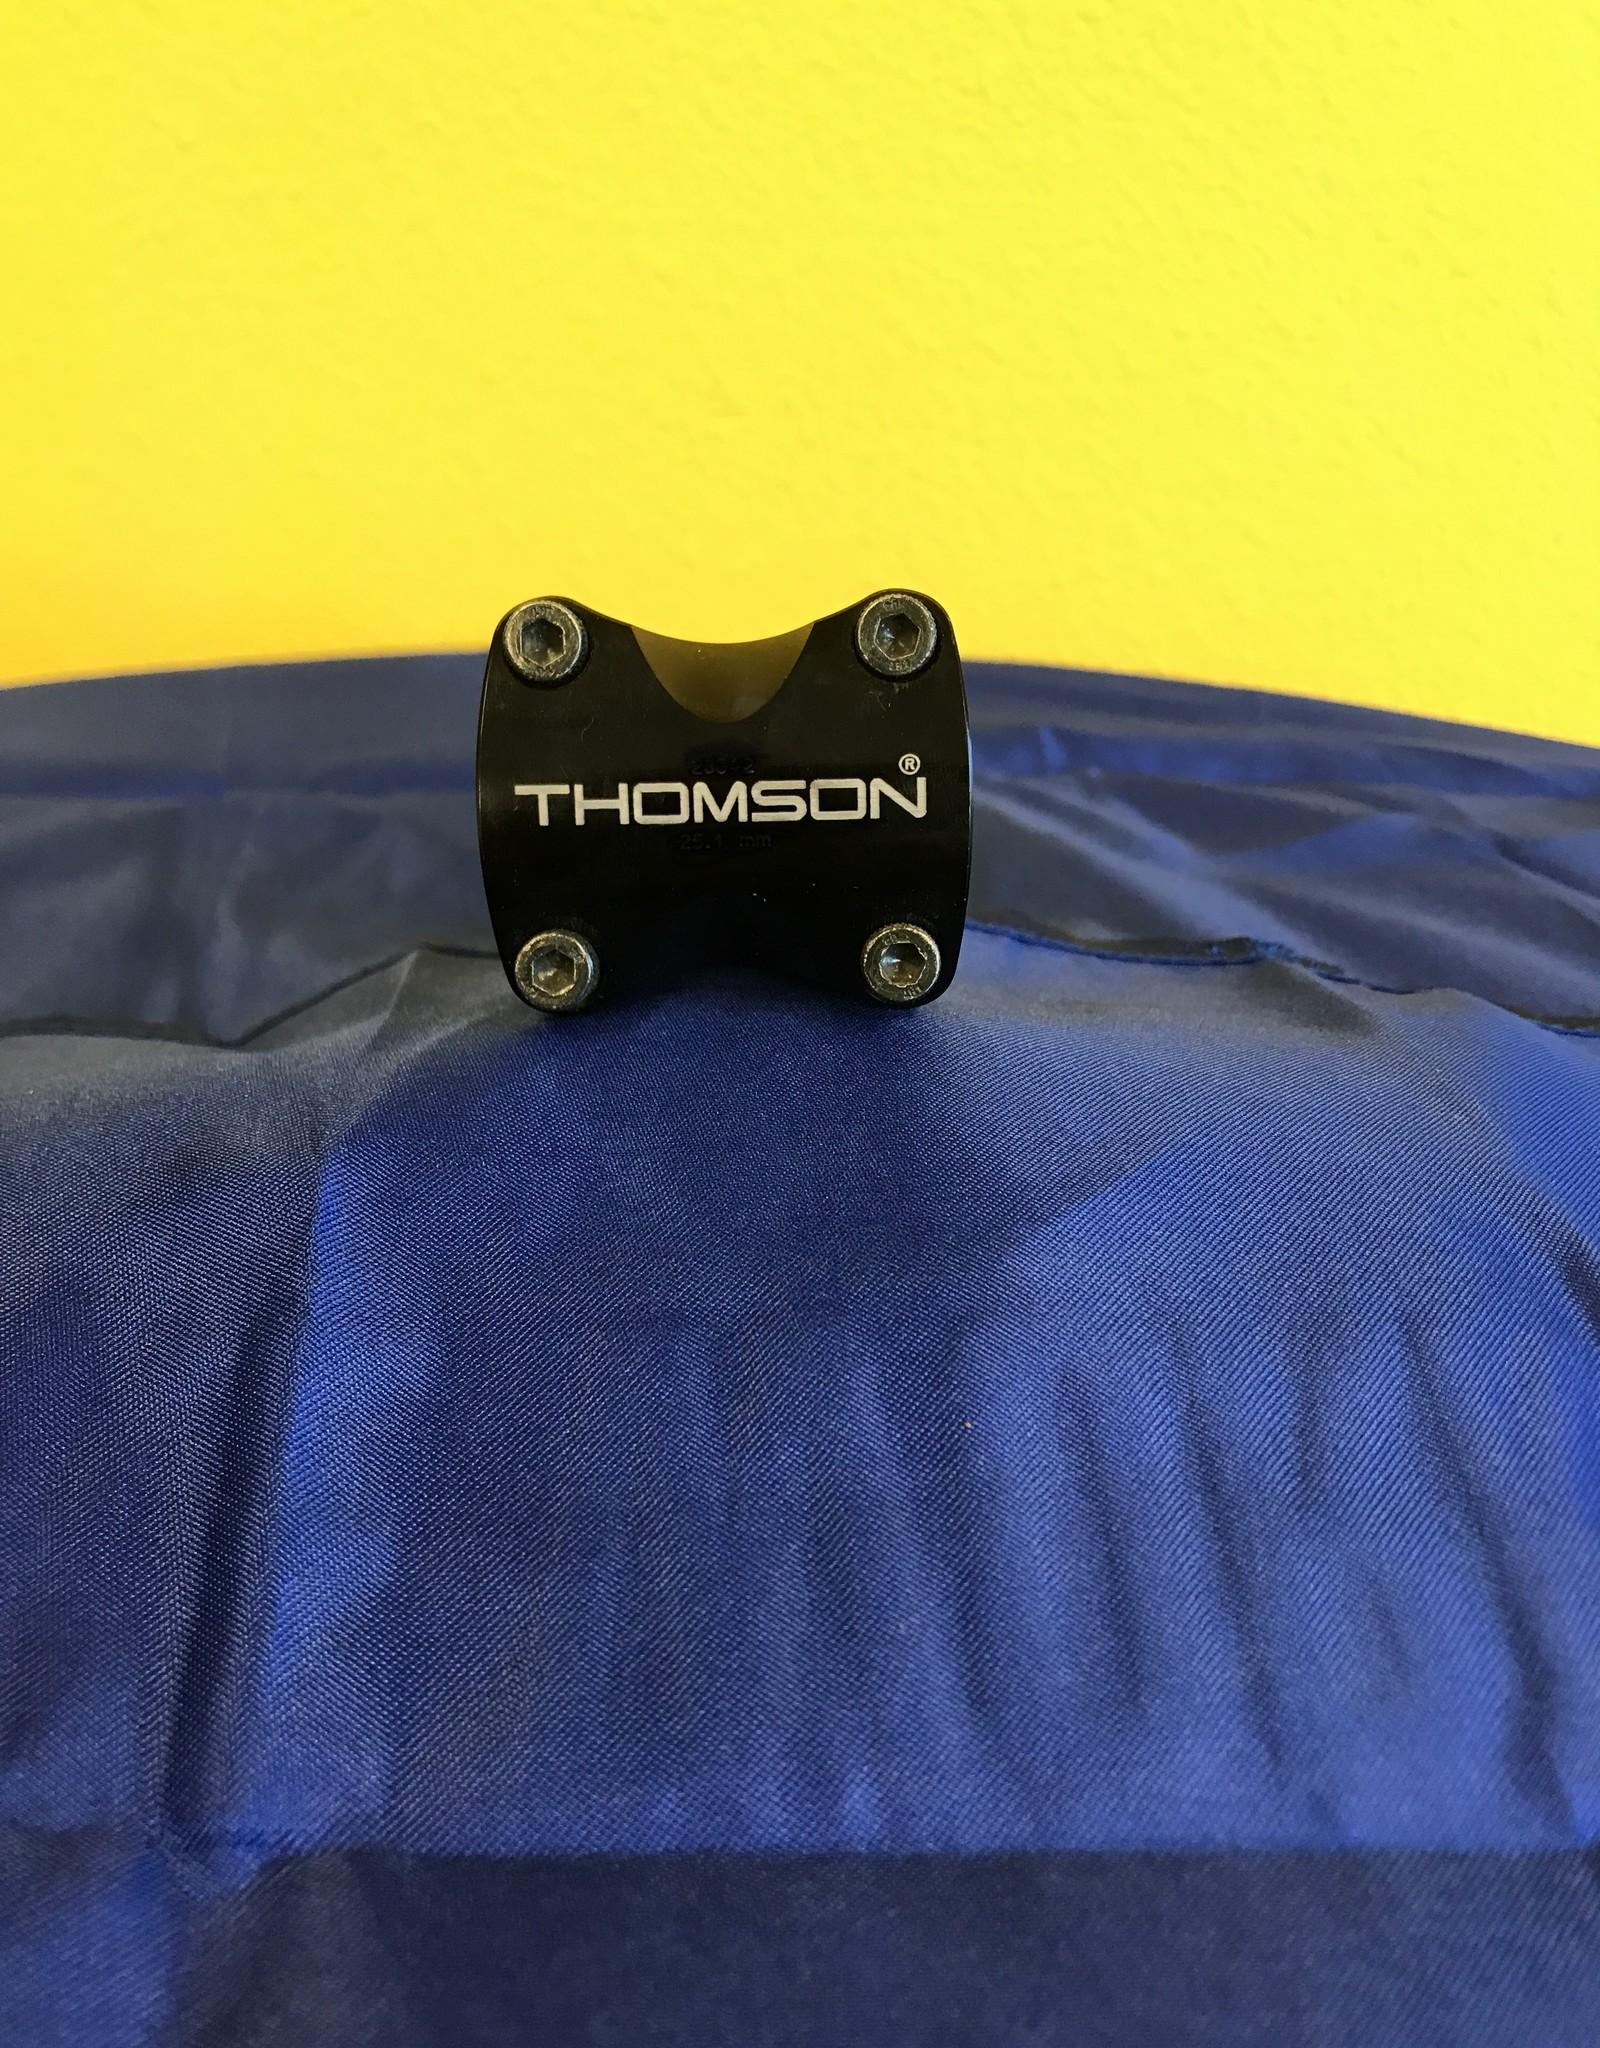 Thomson Elite Stem 5 Degree (120mm)